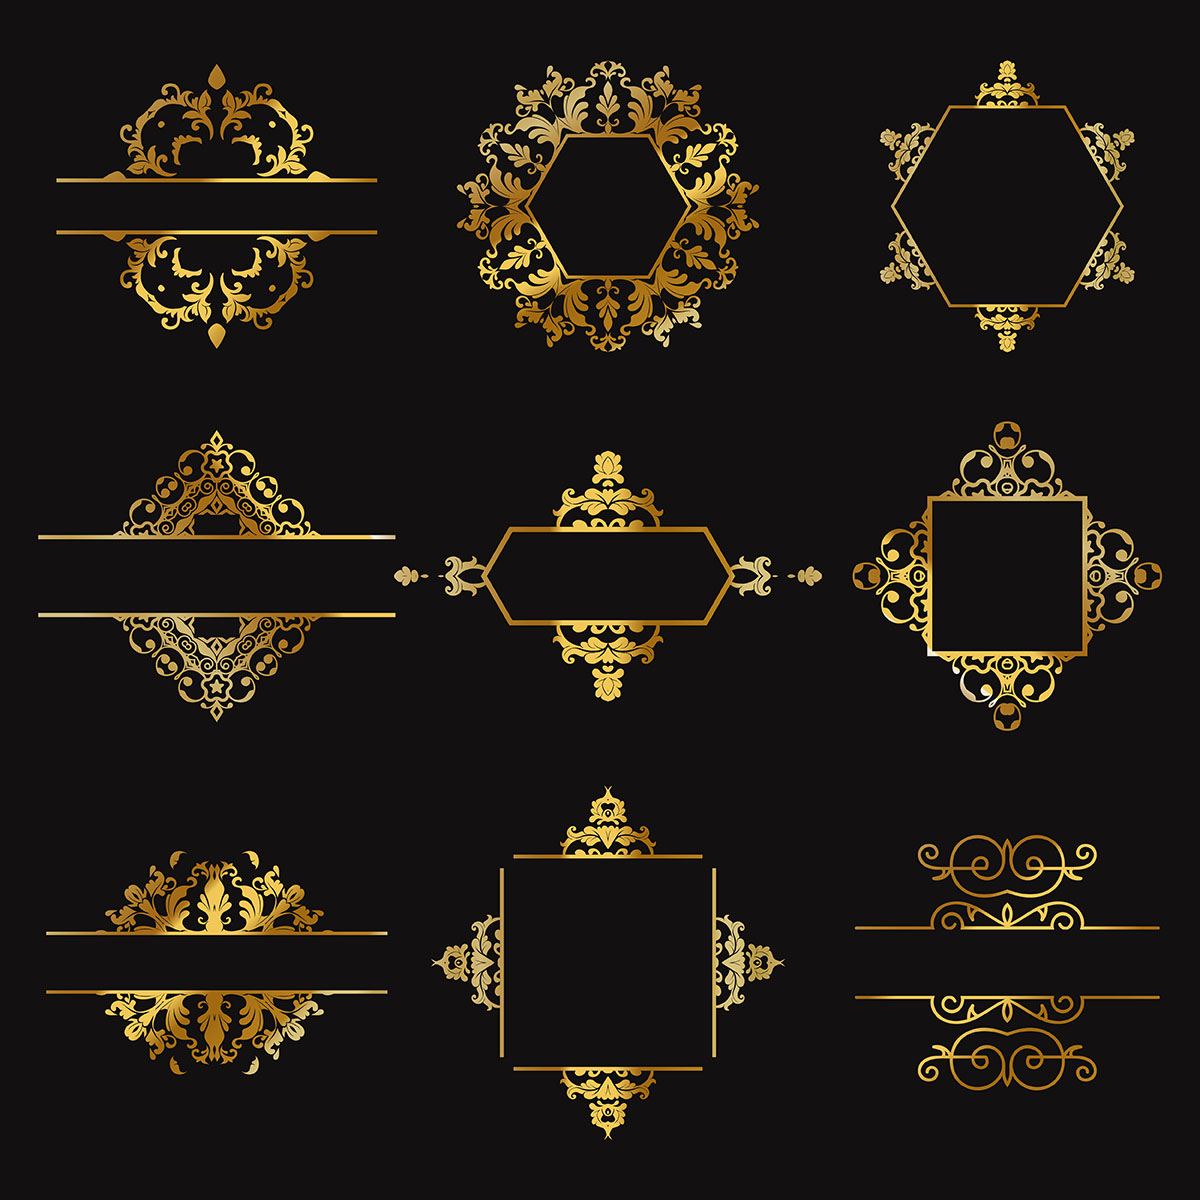 Gold Designs Free Vector Art - (35340 Free Downloads)